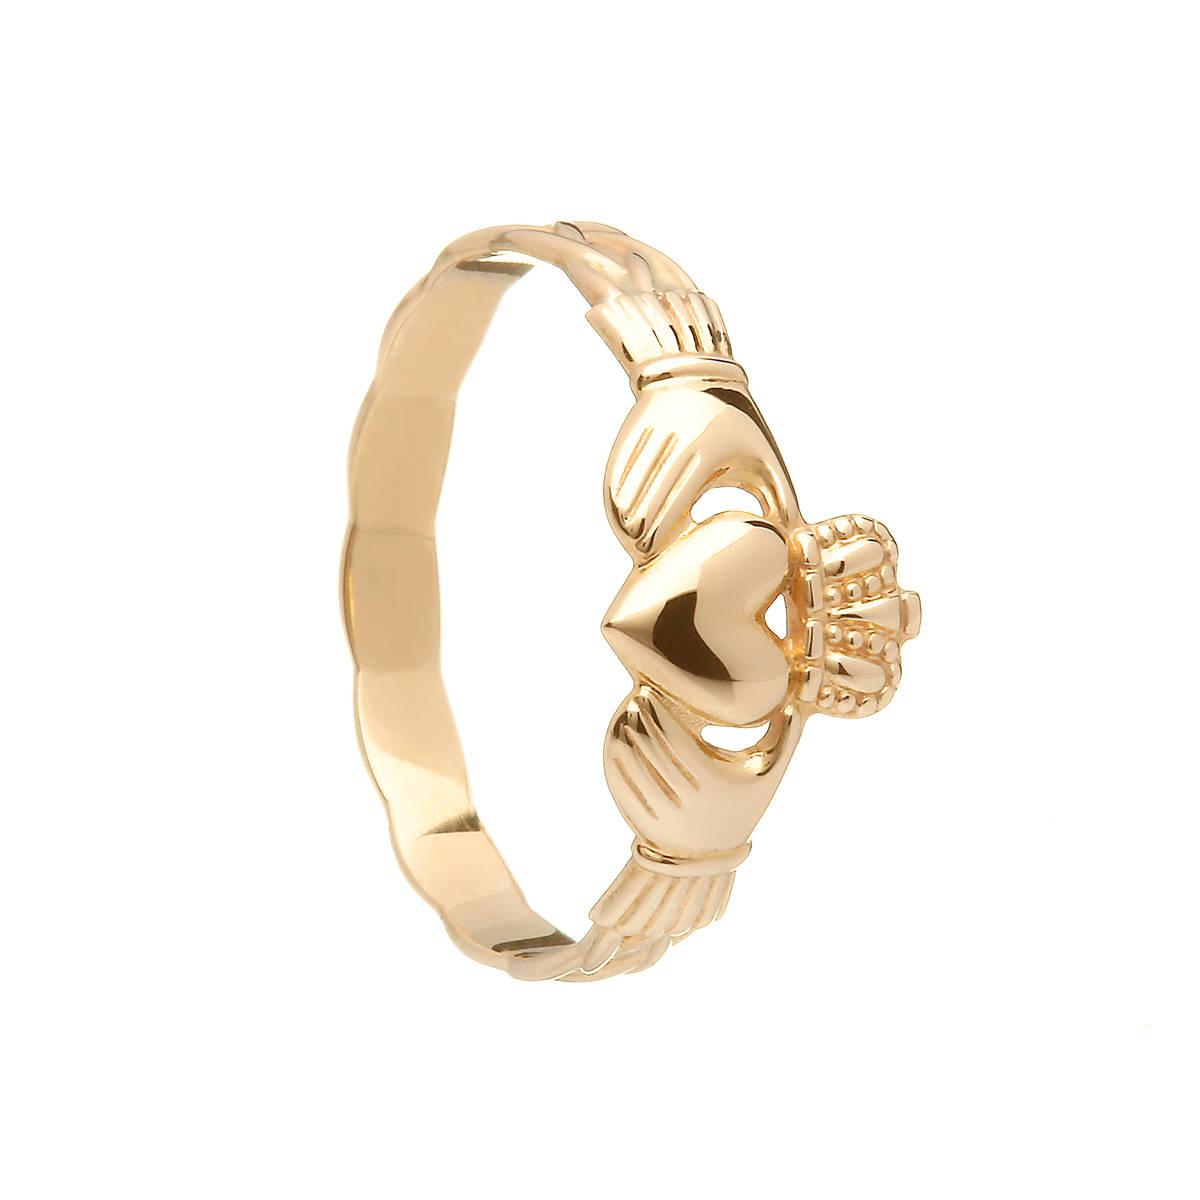 10 carat gold claddagh ring